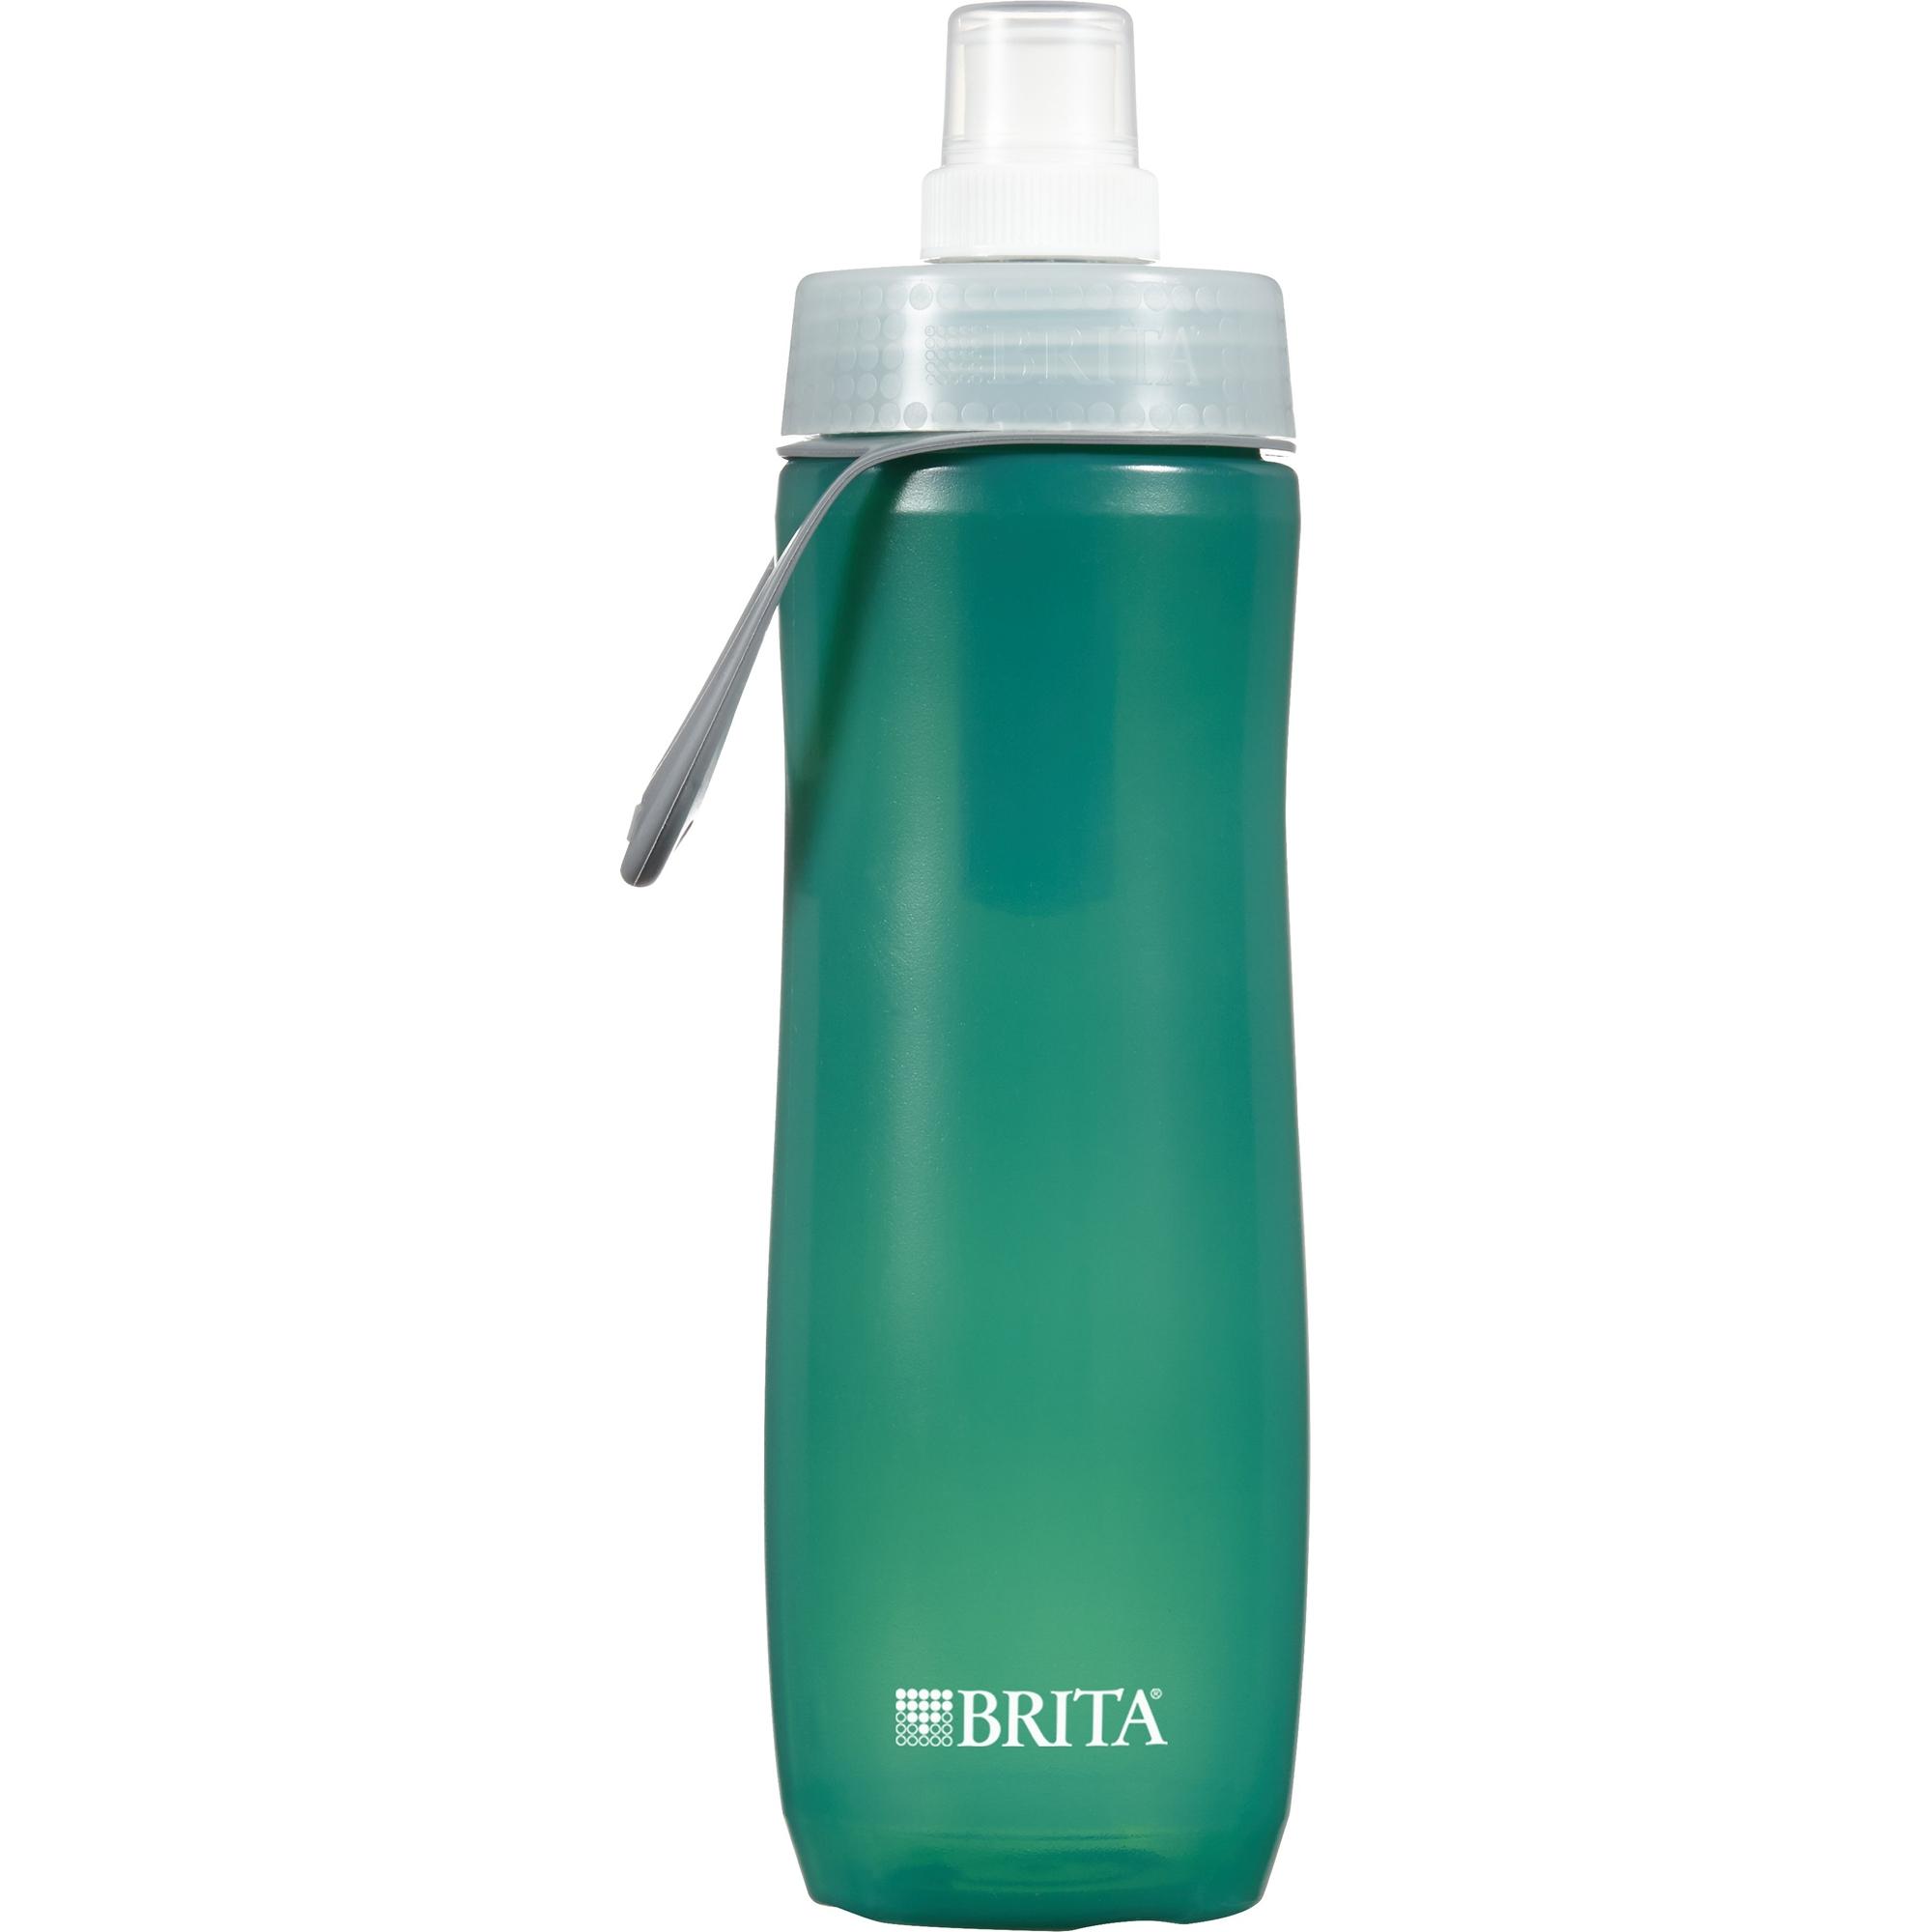 Brita 20 Ounce Sport Water Bottle with 1 Filter, BPA Free, Dark Green